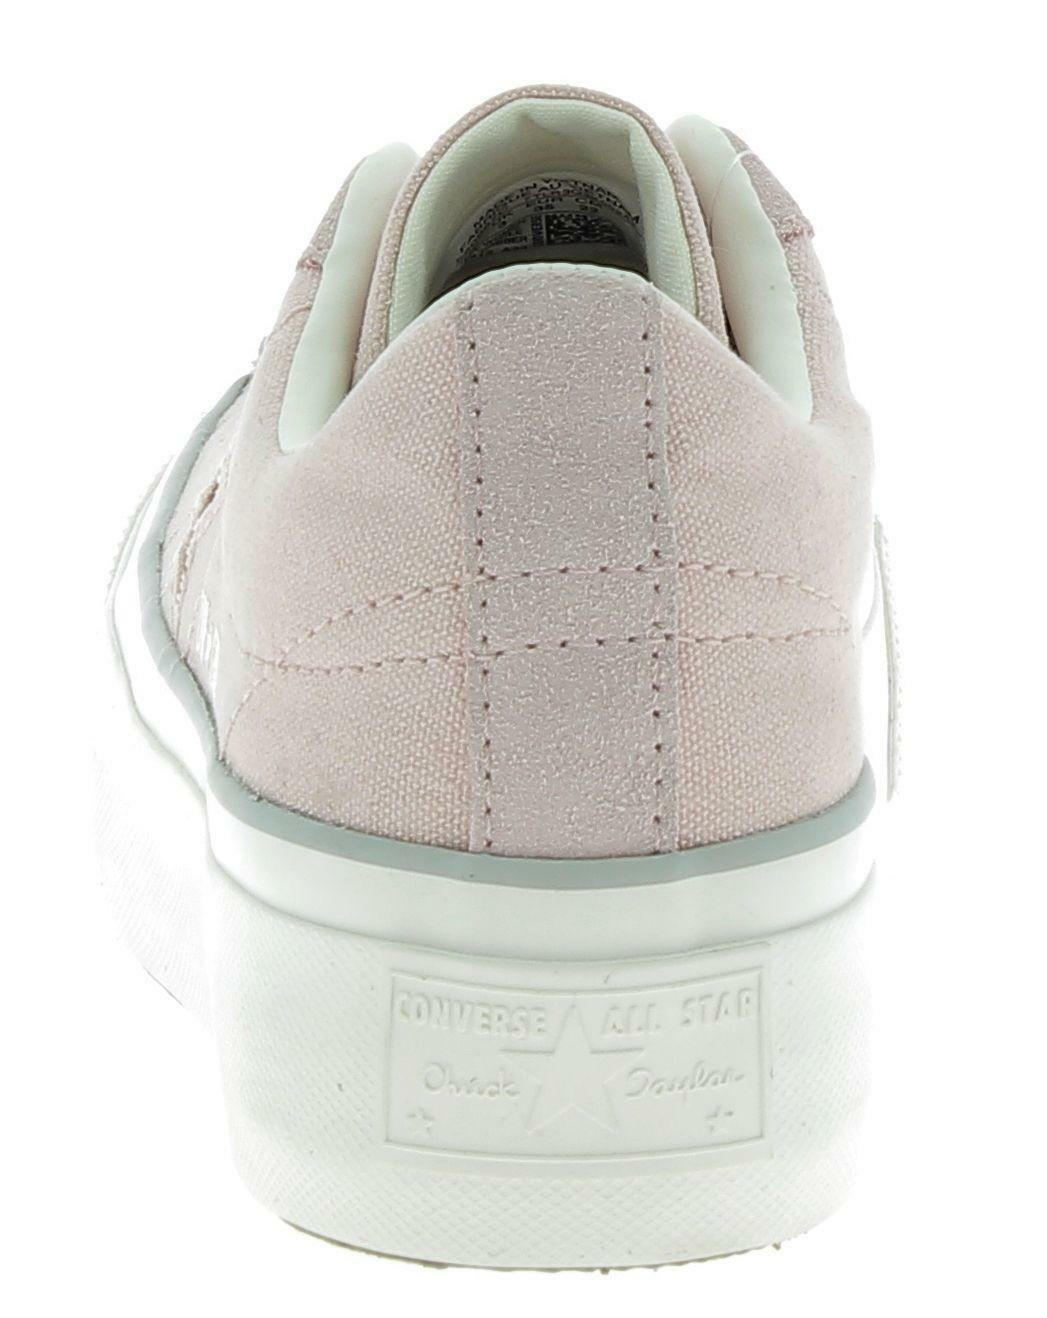 converse converse one star platform scarpe sportive donna rosa